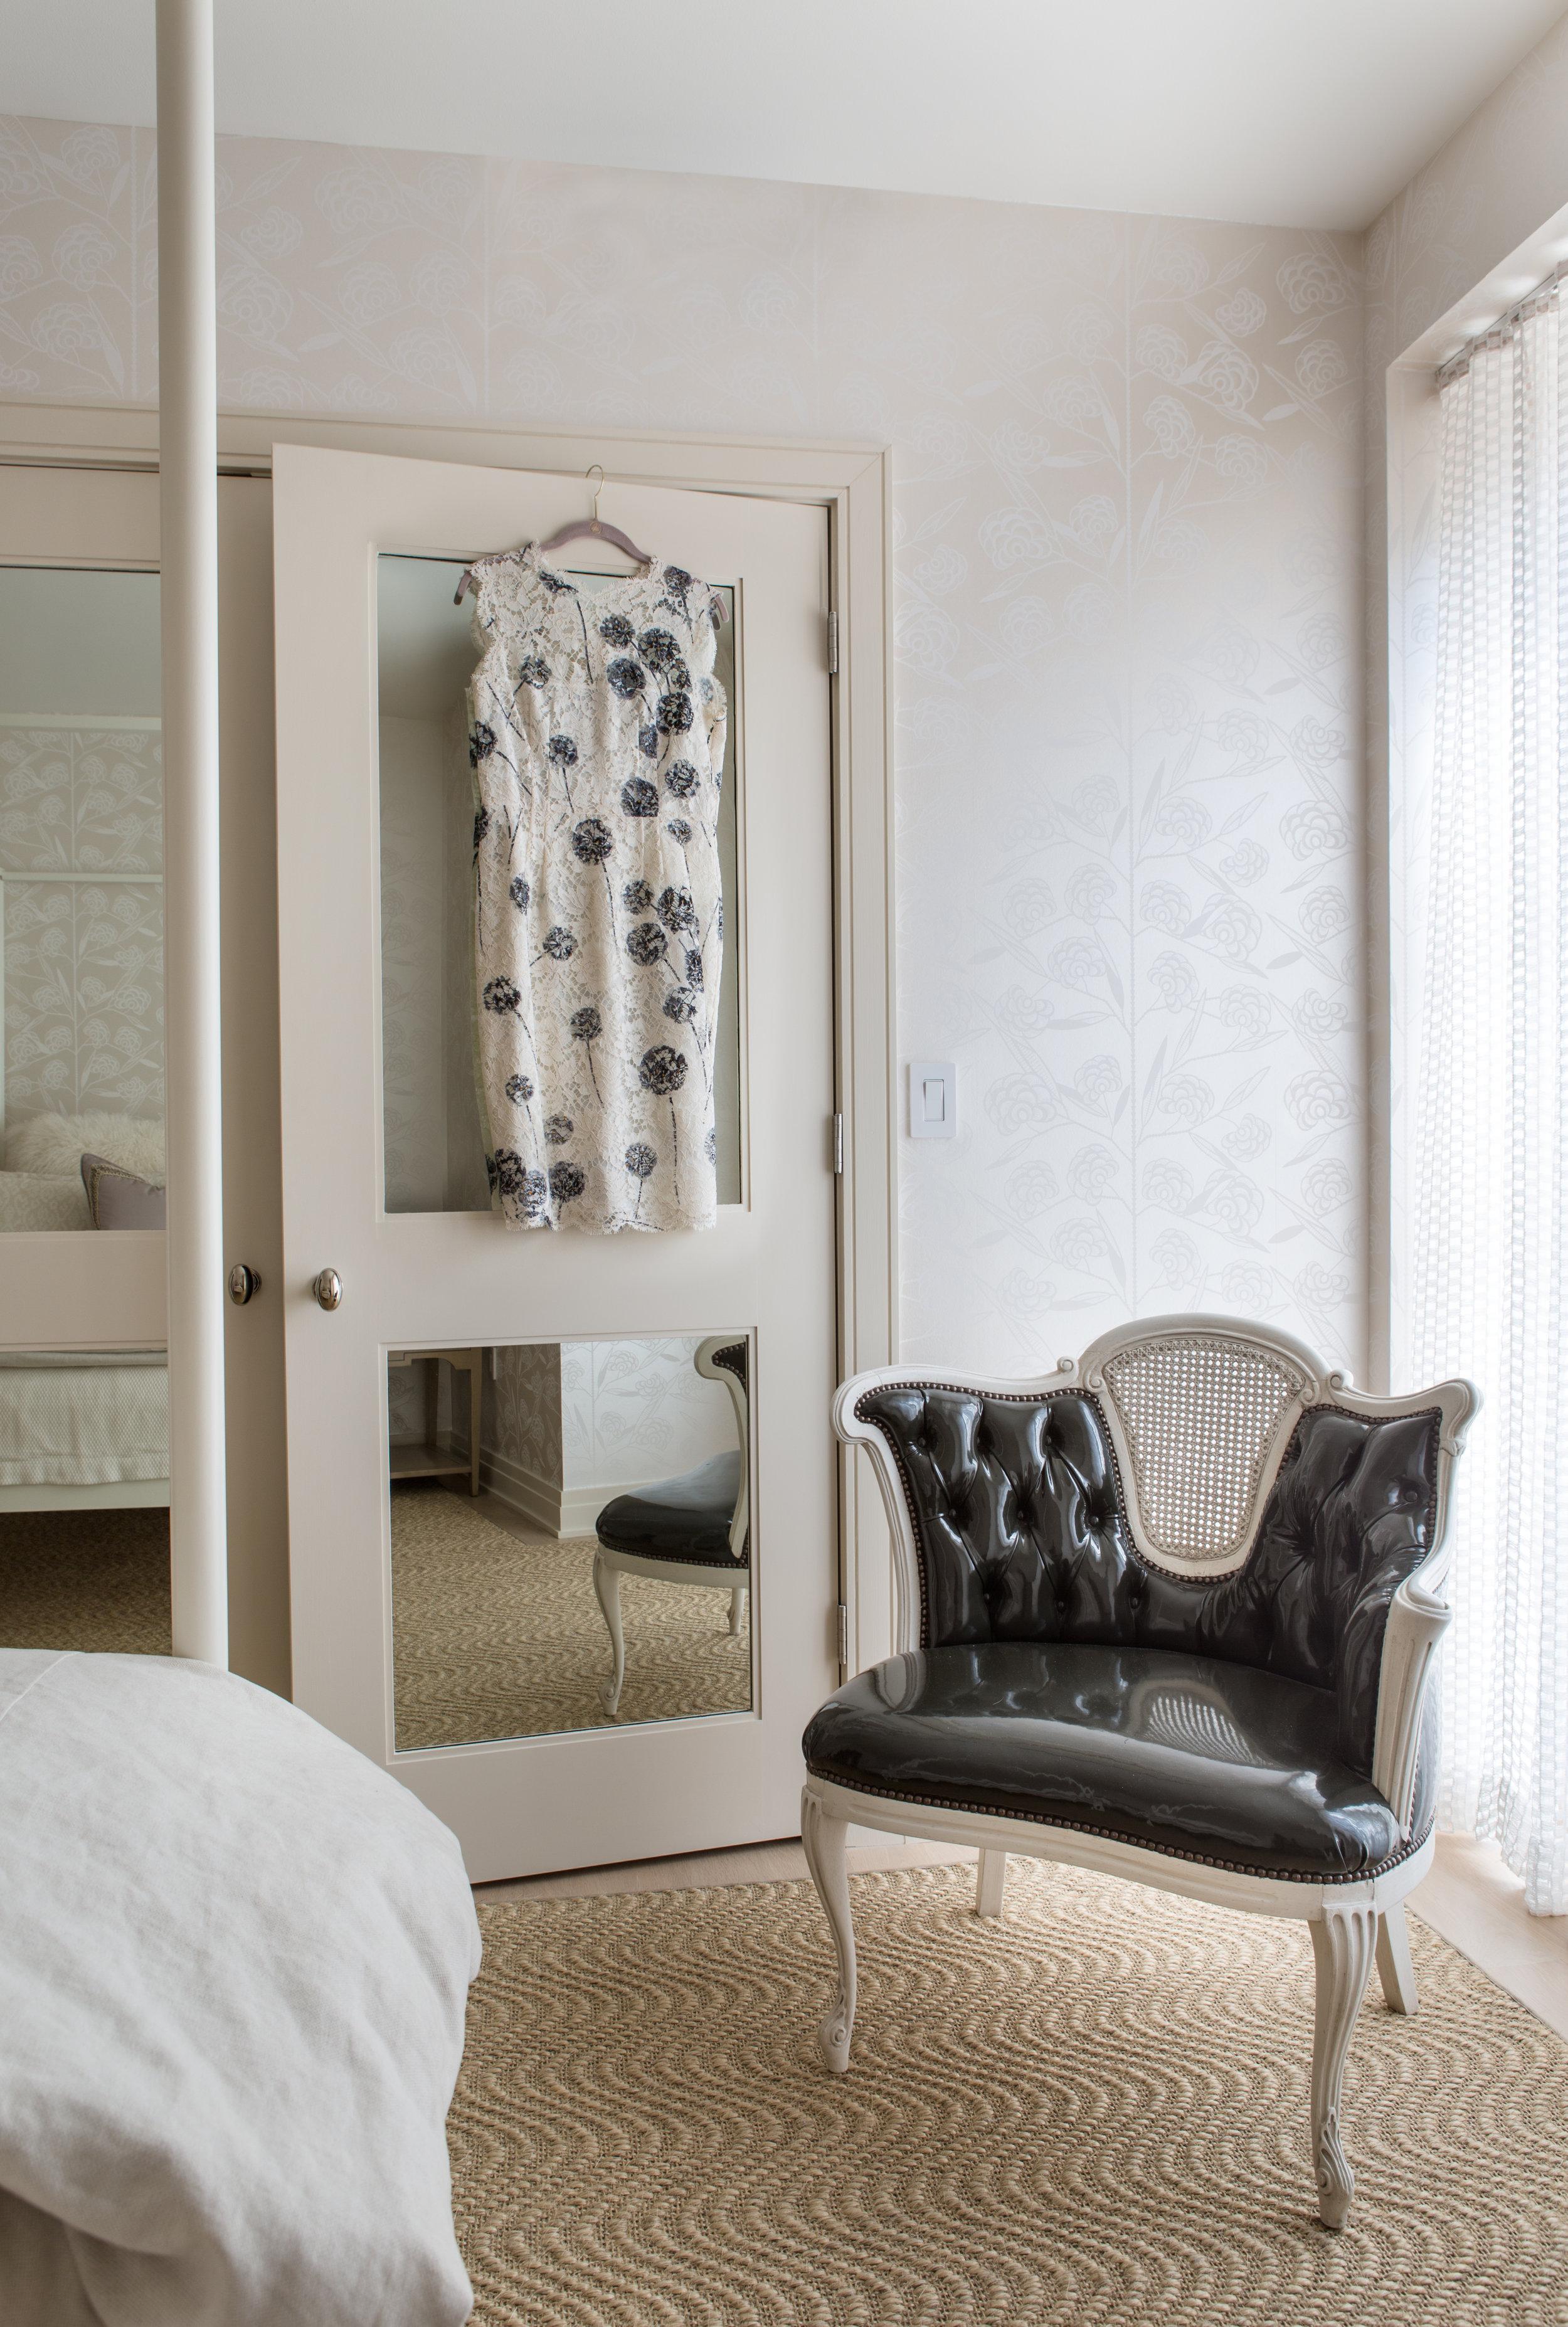 Montrose pied a terre bedroom // Huntley & Co.